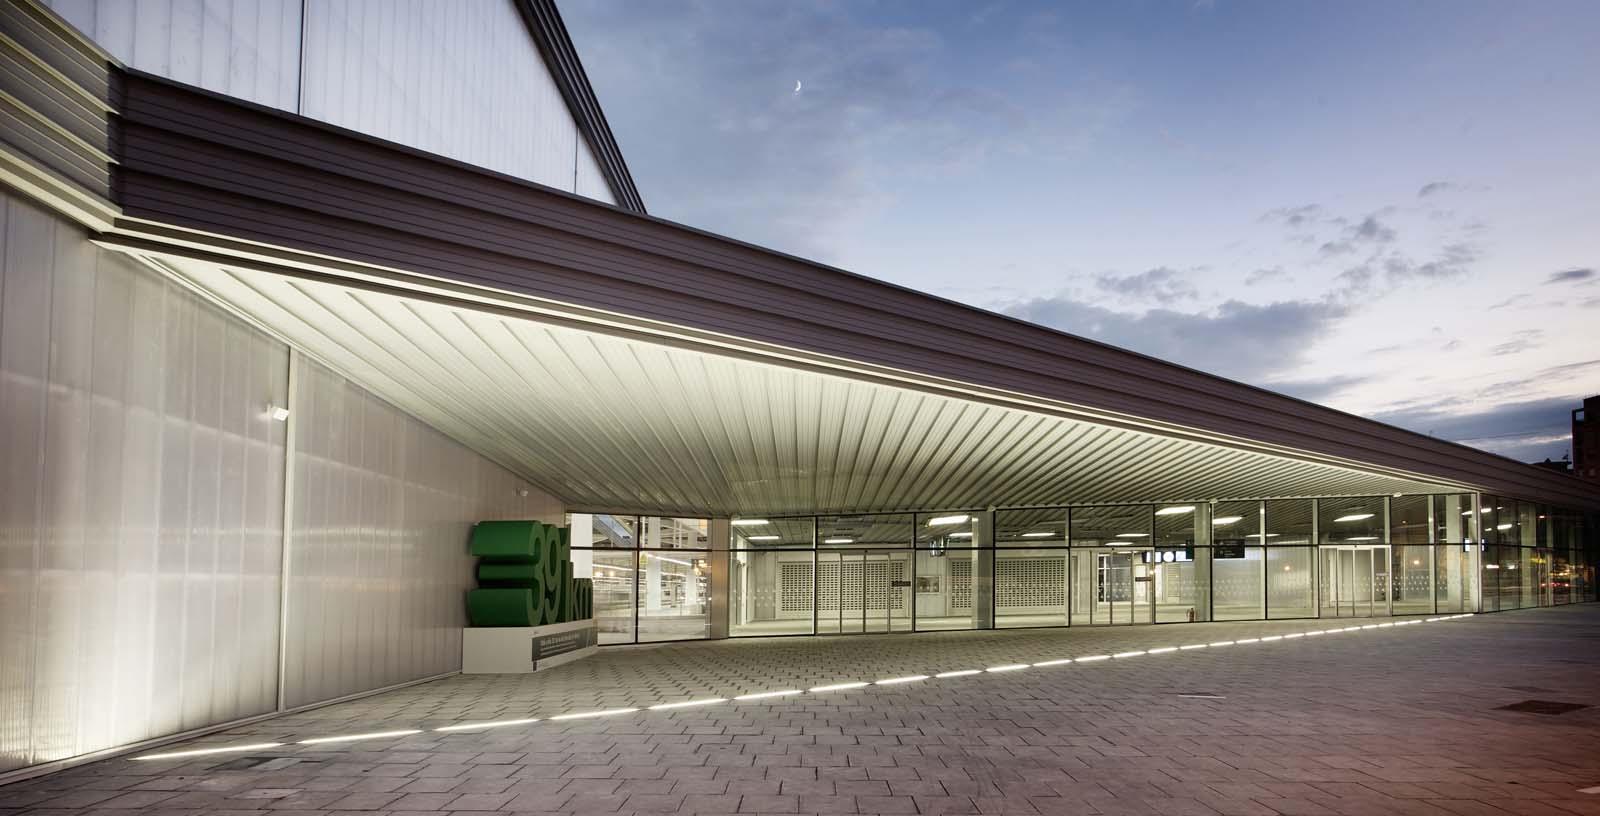 Joaquin_Sorolla_Station_02_Architecture_IDOM_photos_Alfonso_Calza